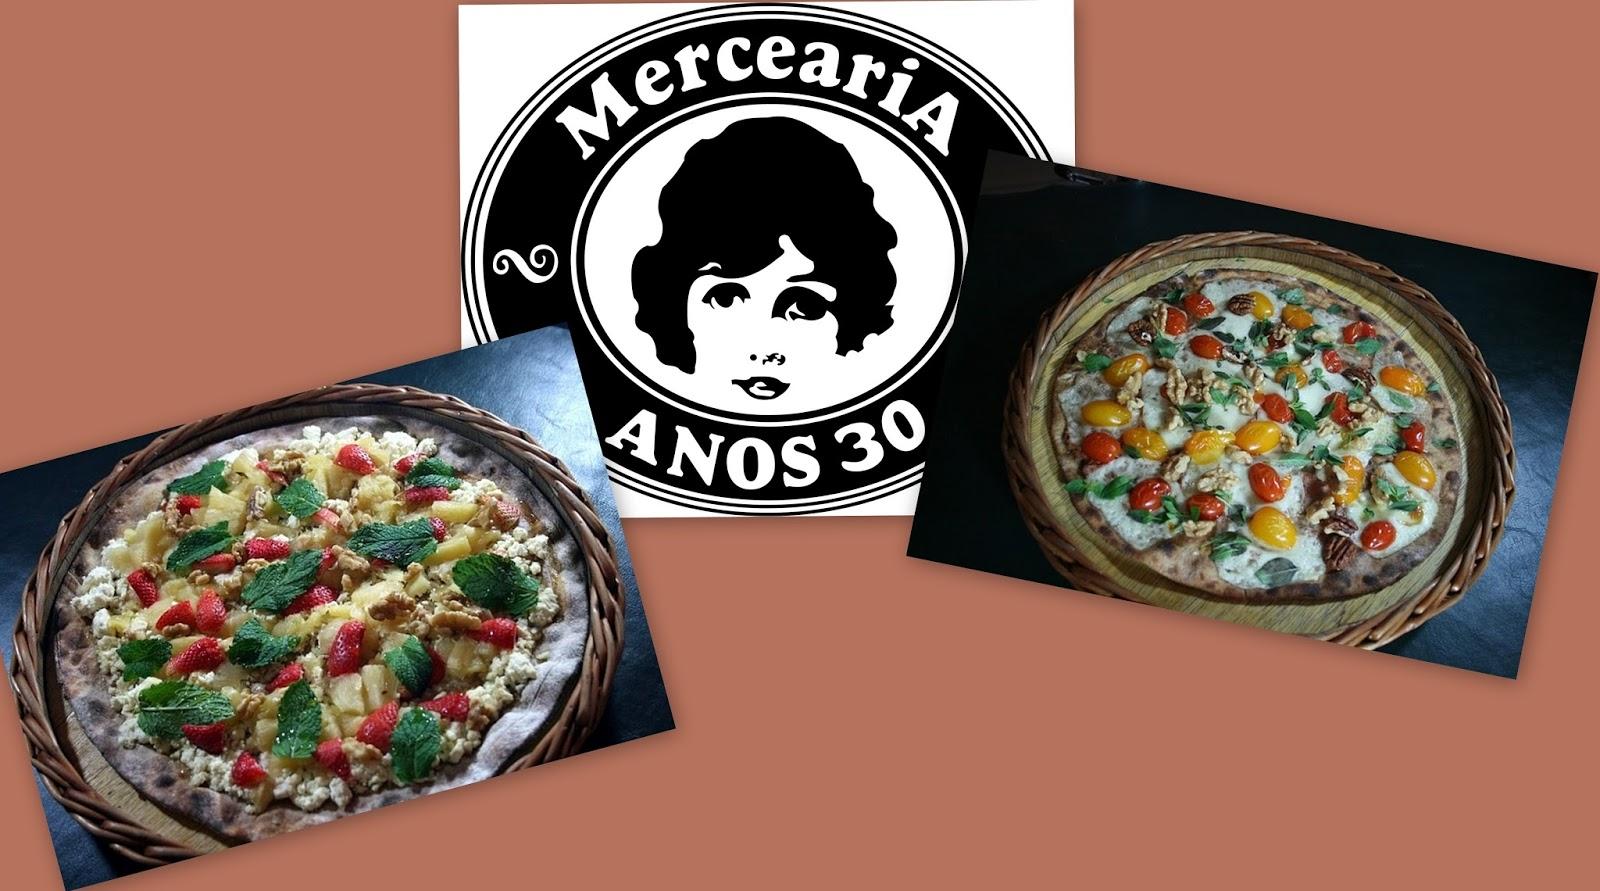 Marian Guimaraes Emblog Pizzas Light Na Mercearia Anos 30